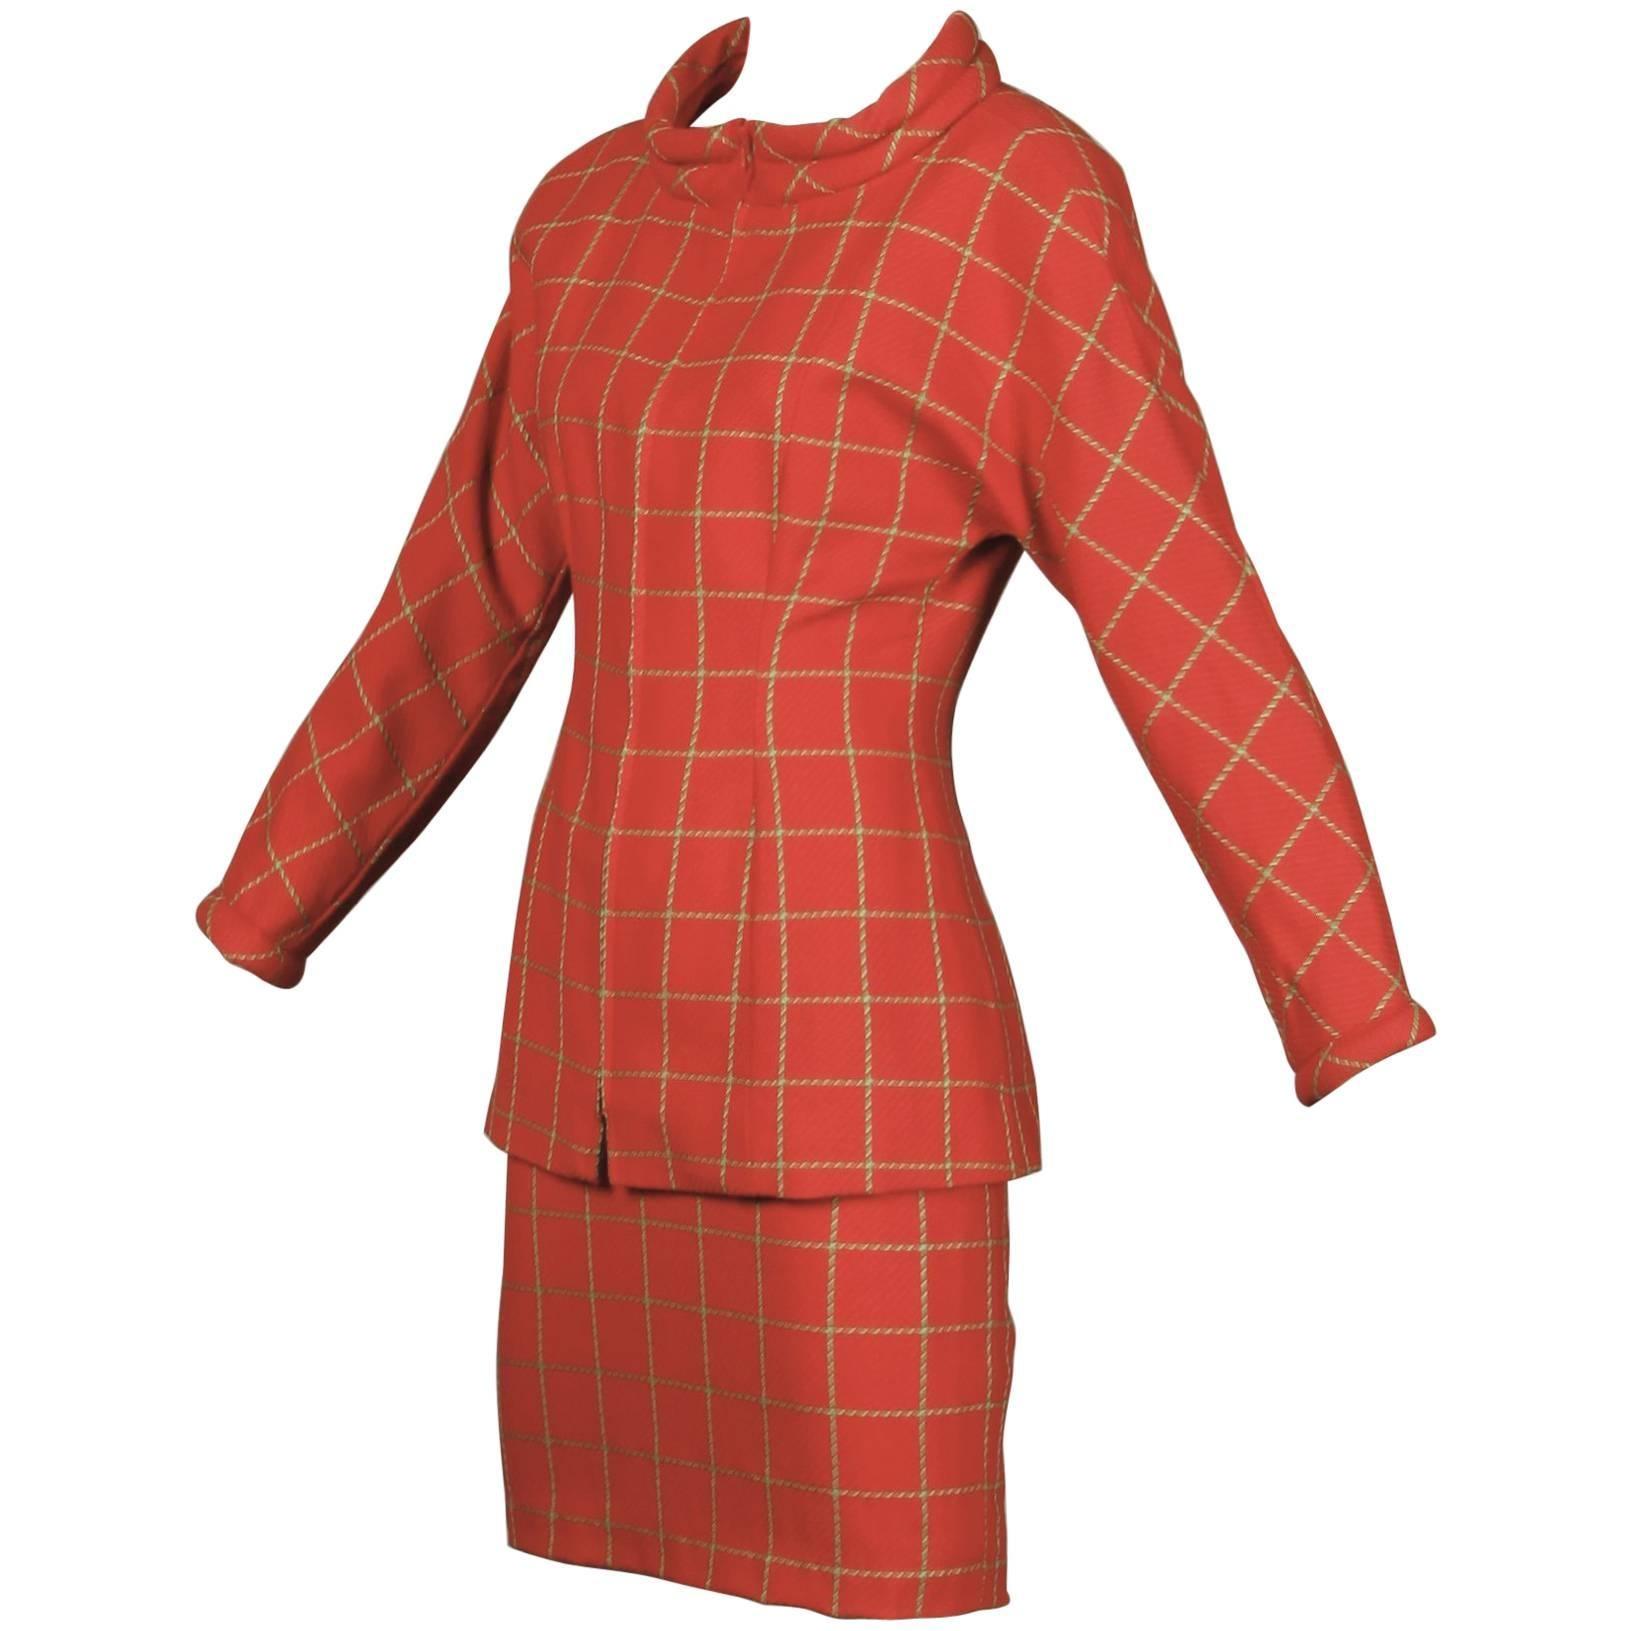 1980s Bernard Perris Vintage Wool/ Cashmere Jacket + Skirt Suit Ensemble